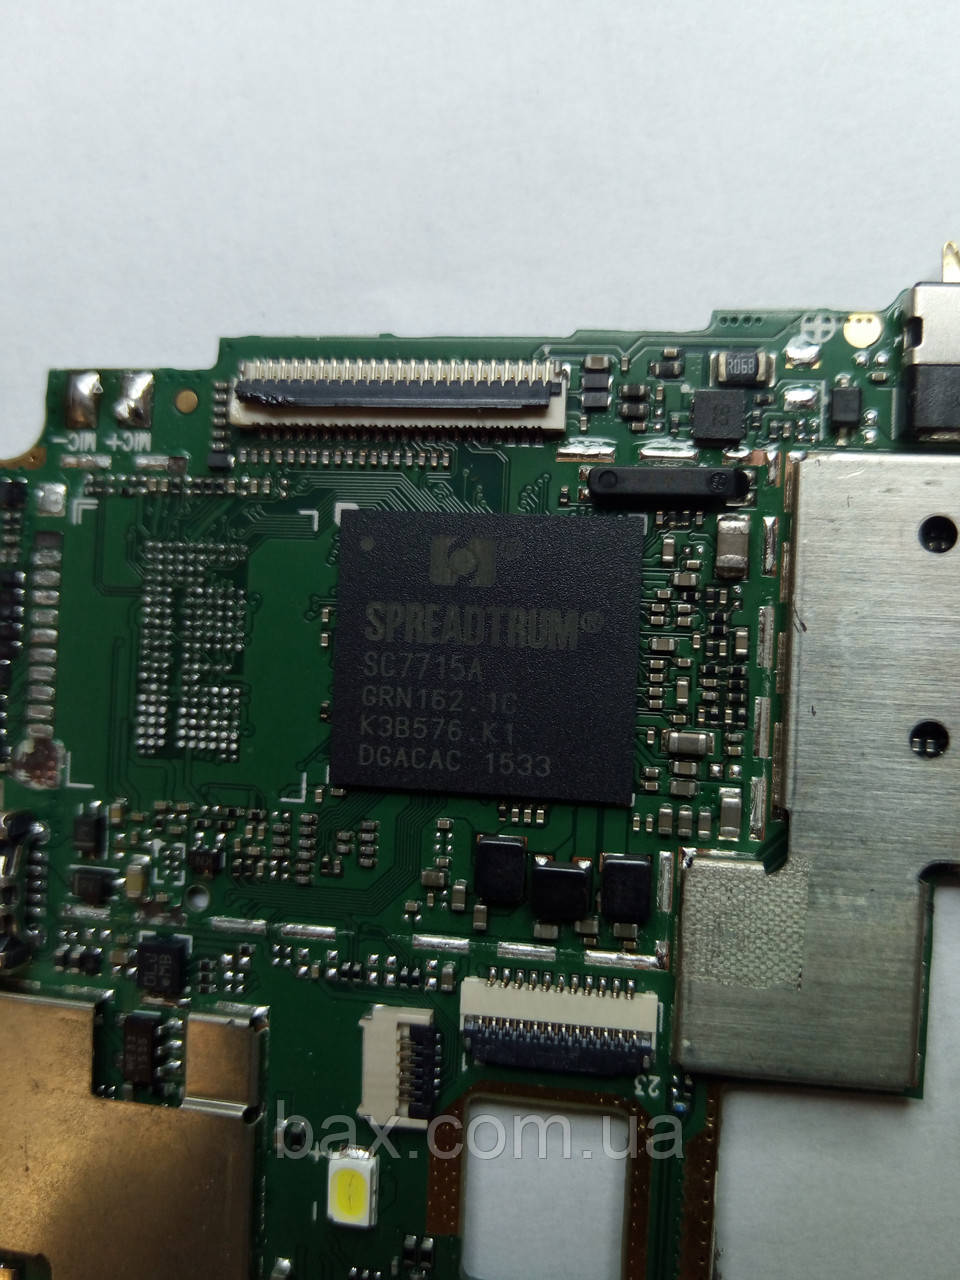 Микросхема процессора Spreadtrum SC7715A На плате Описание